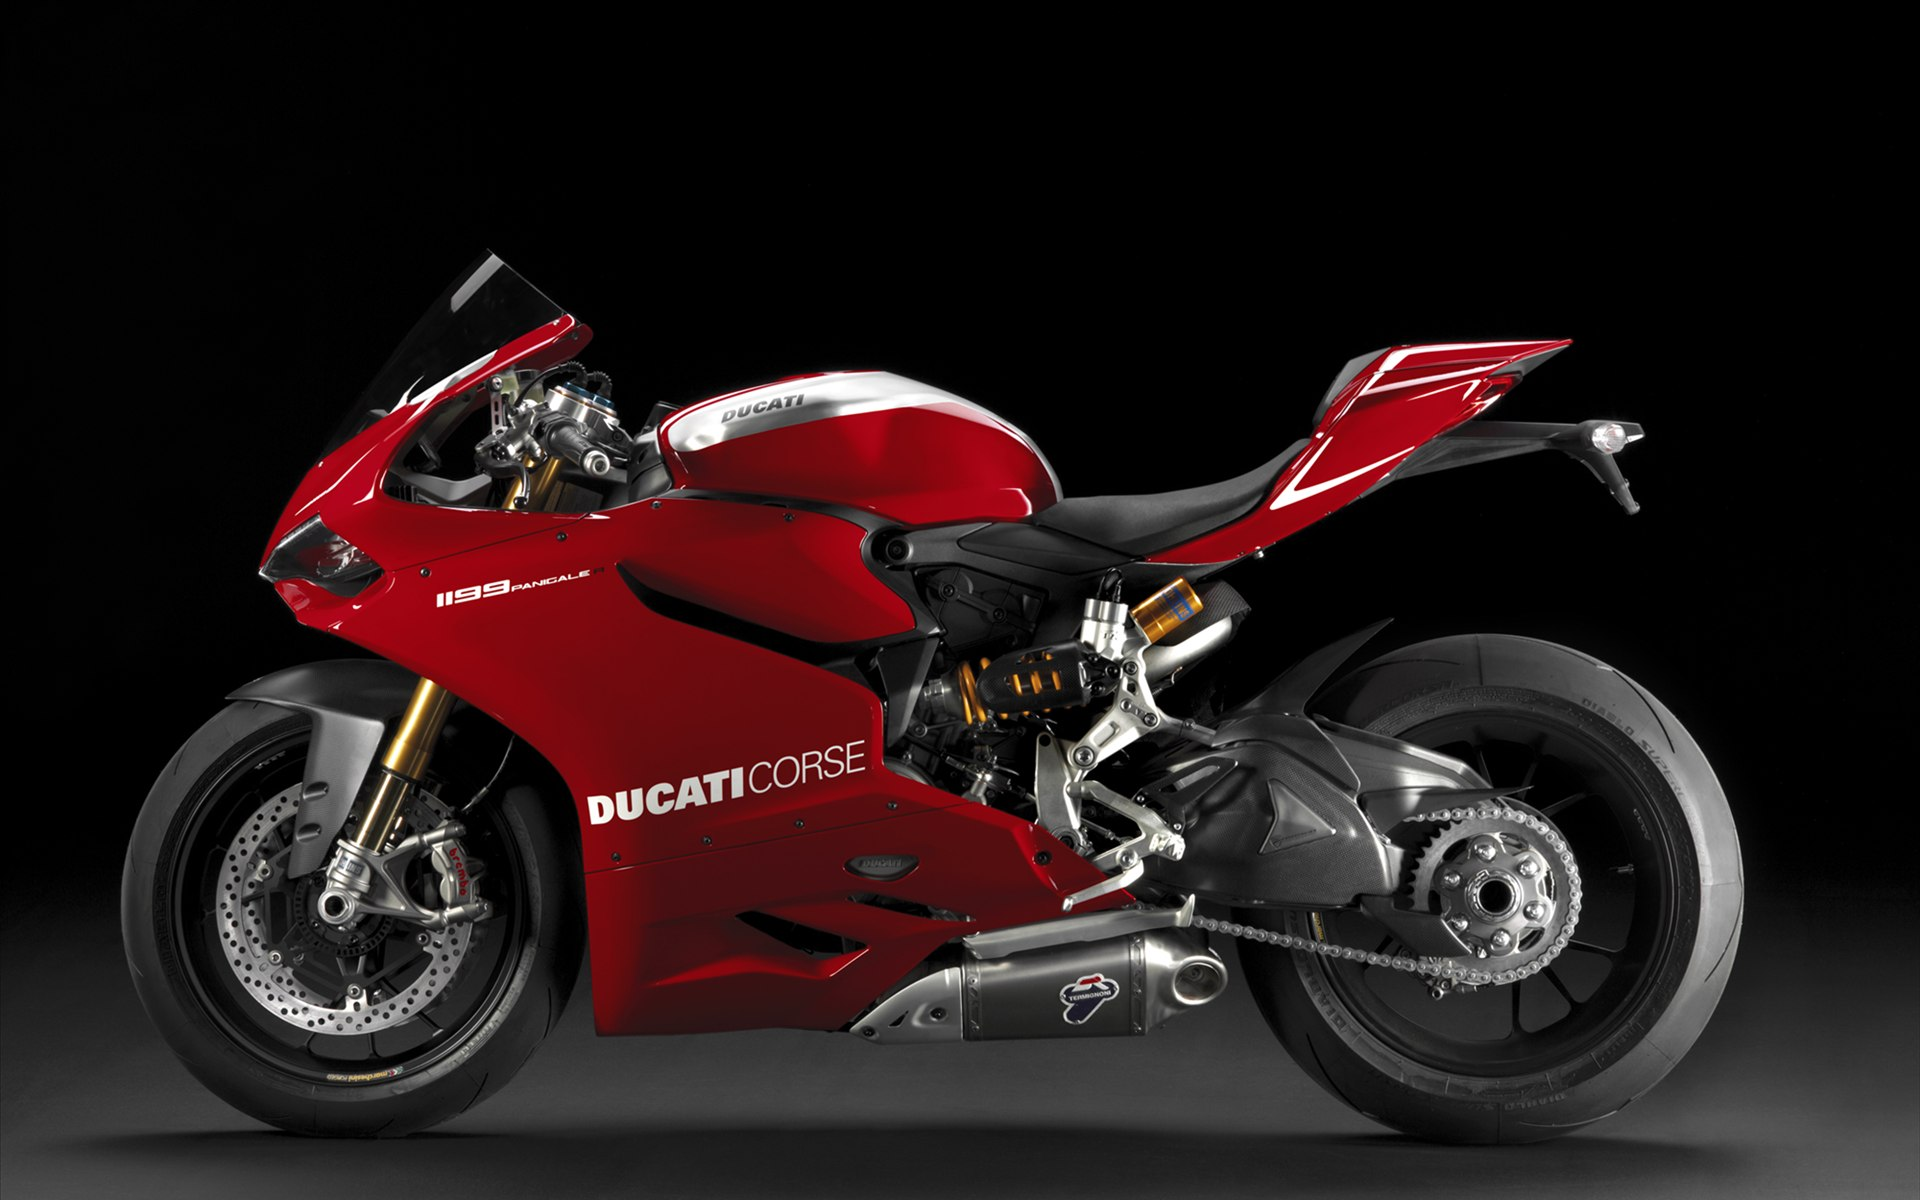 Ducati Superbike 1199 Panigale r 2013 Wallpaper 1920x1200